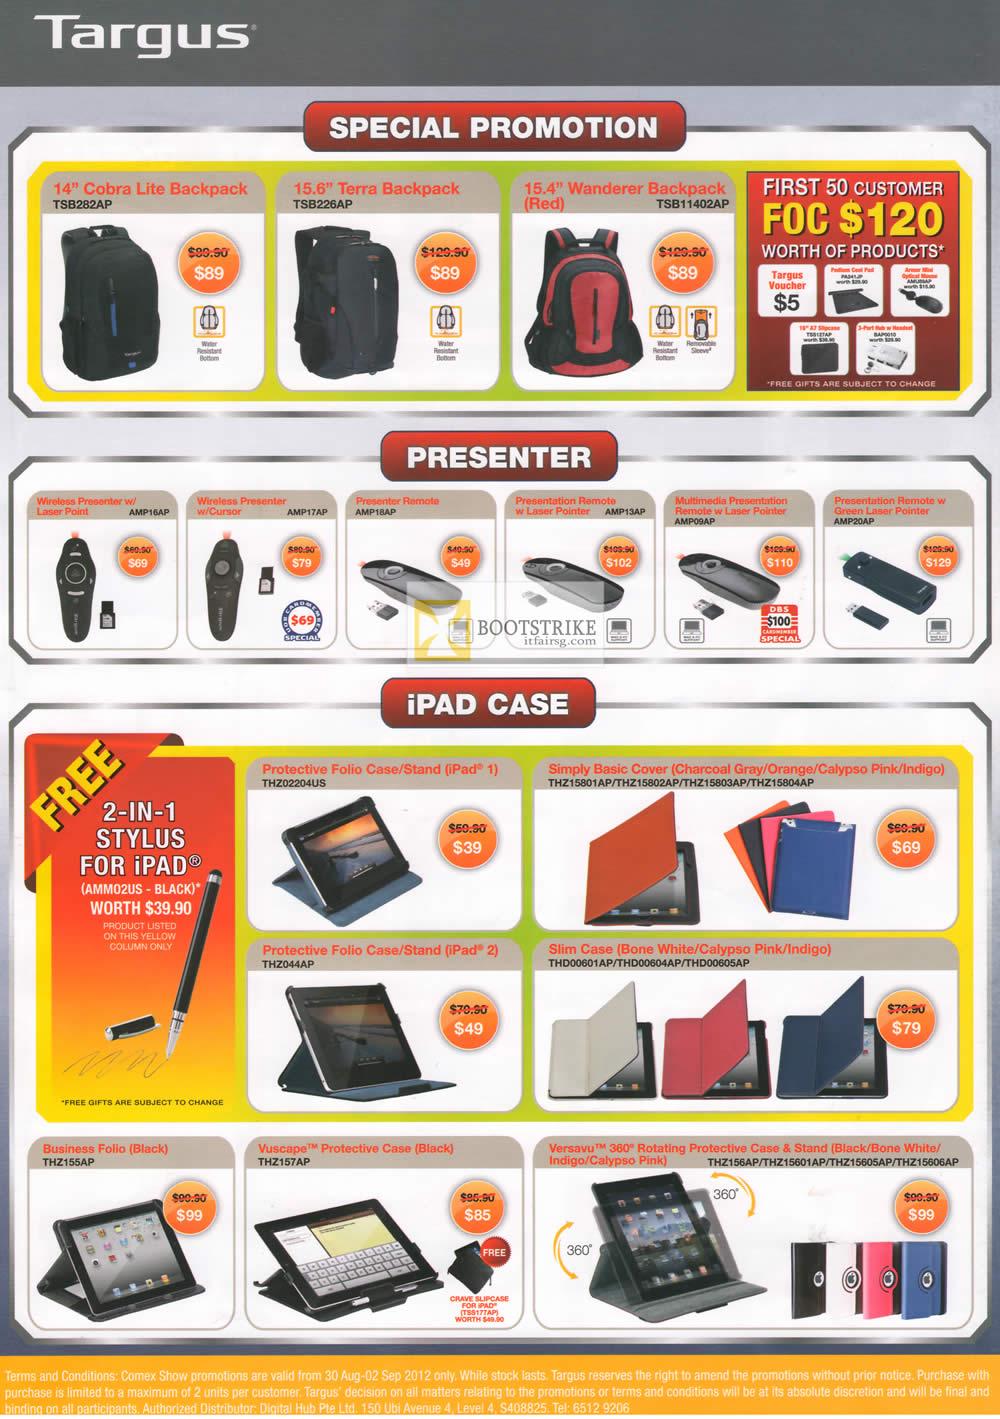 COMEX 2012 price list image brochure of Targus Backpacks Cobra Lite, Terra, Wanderer, Presenter, IPad Case, Folio